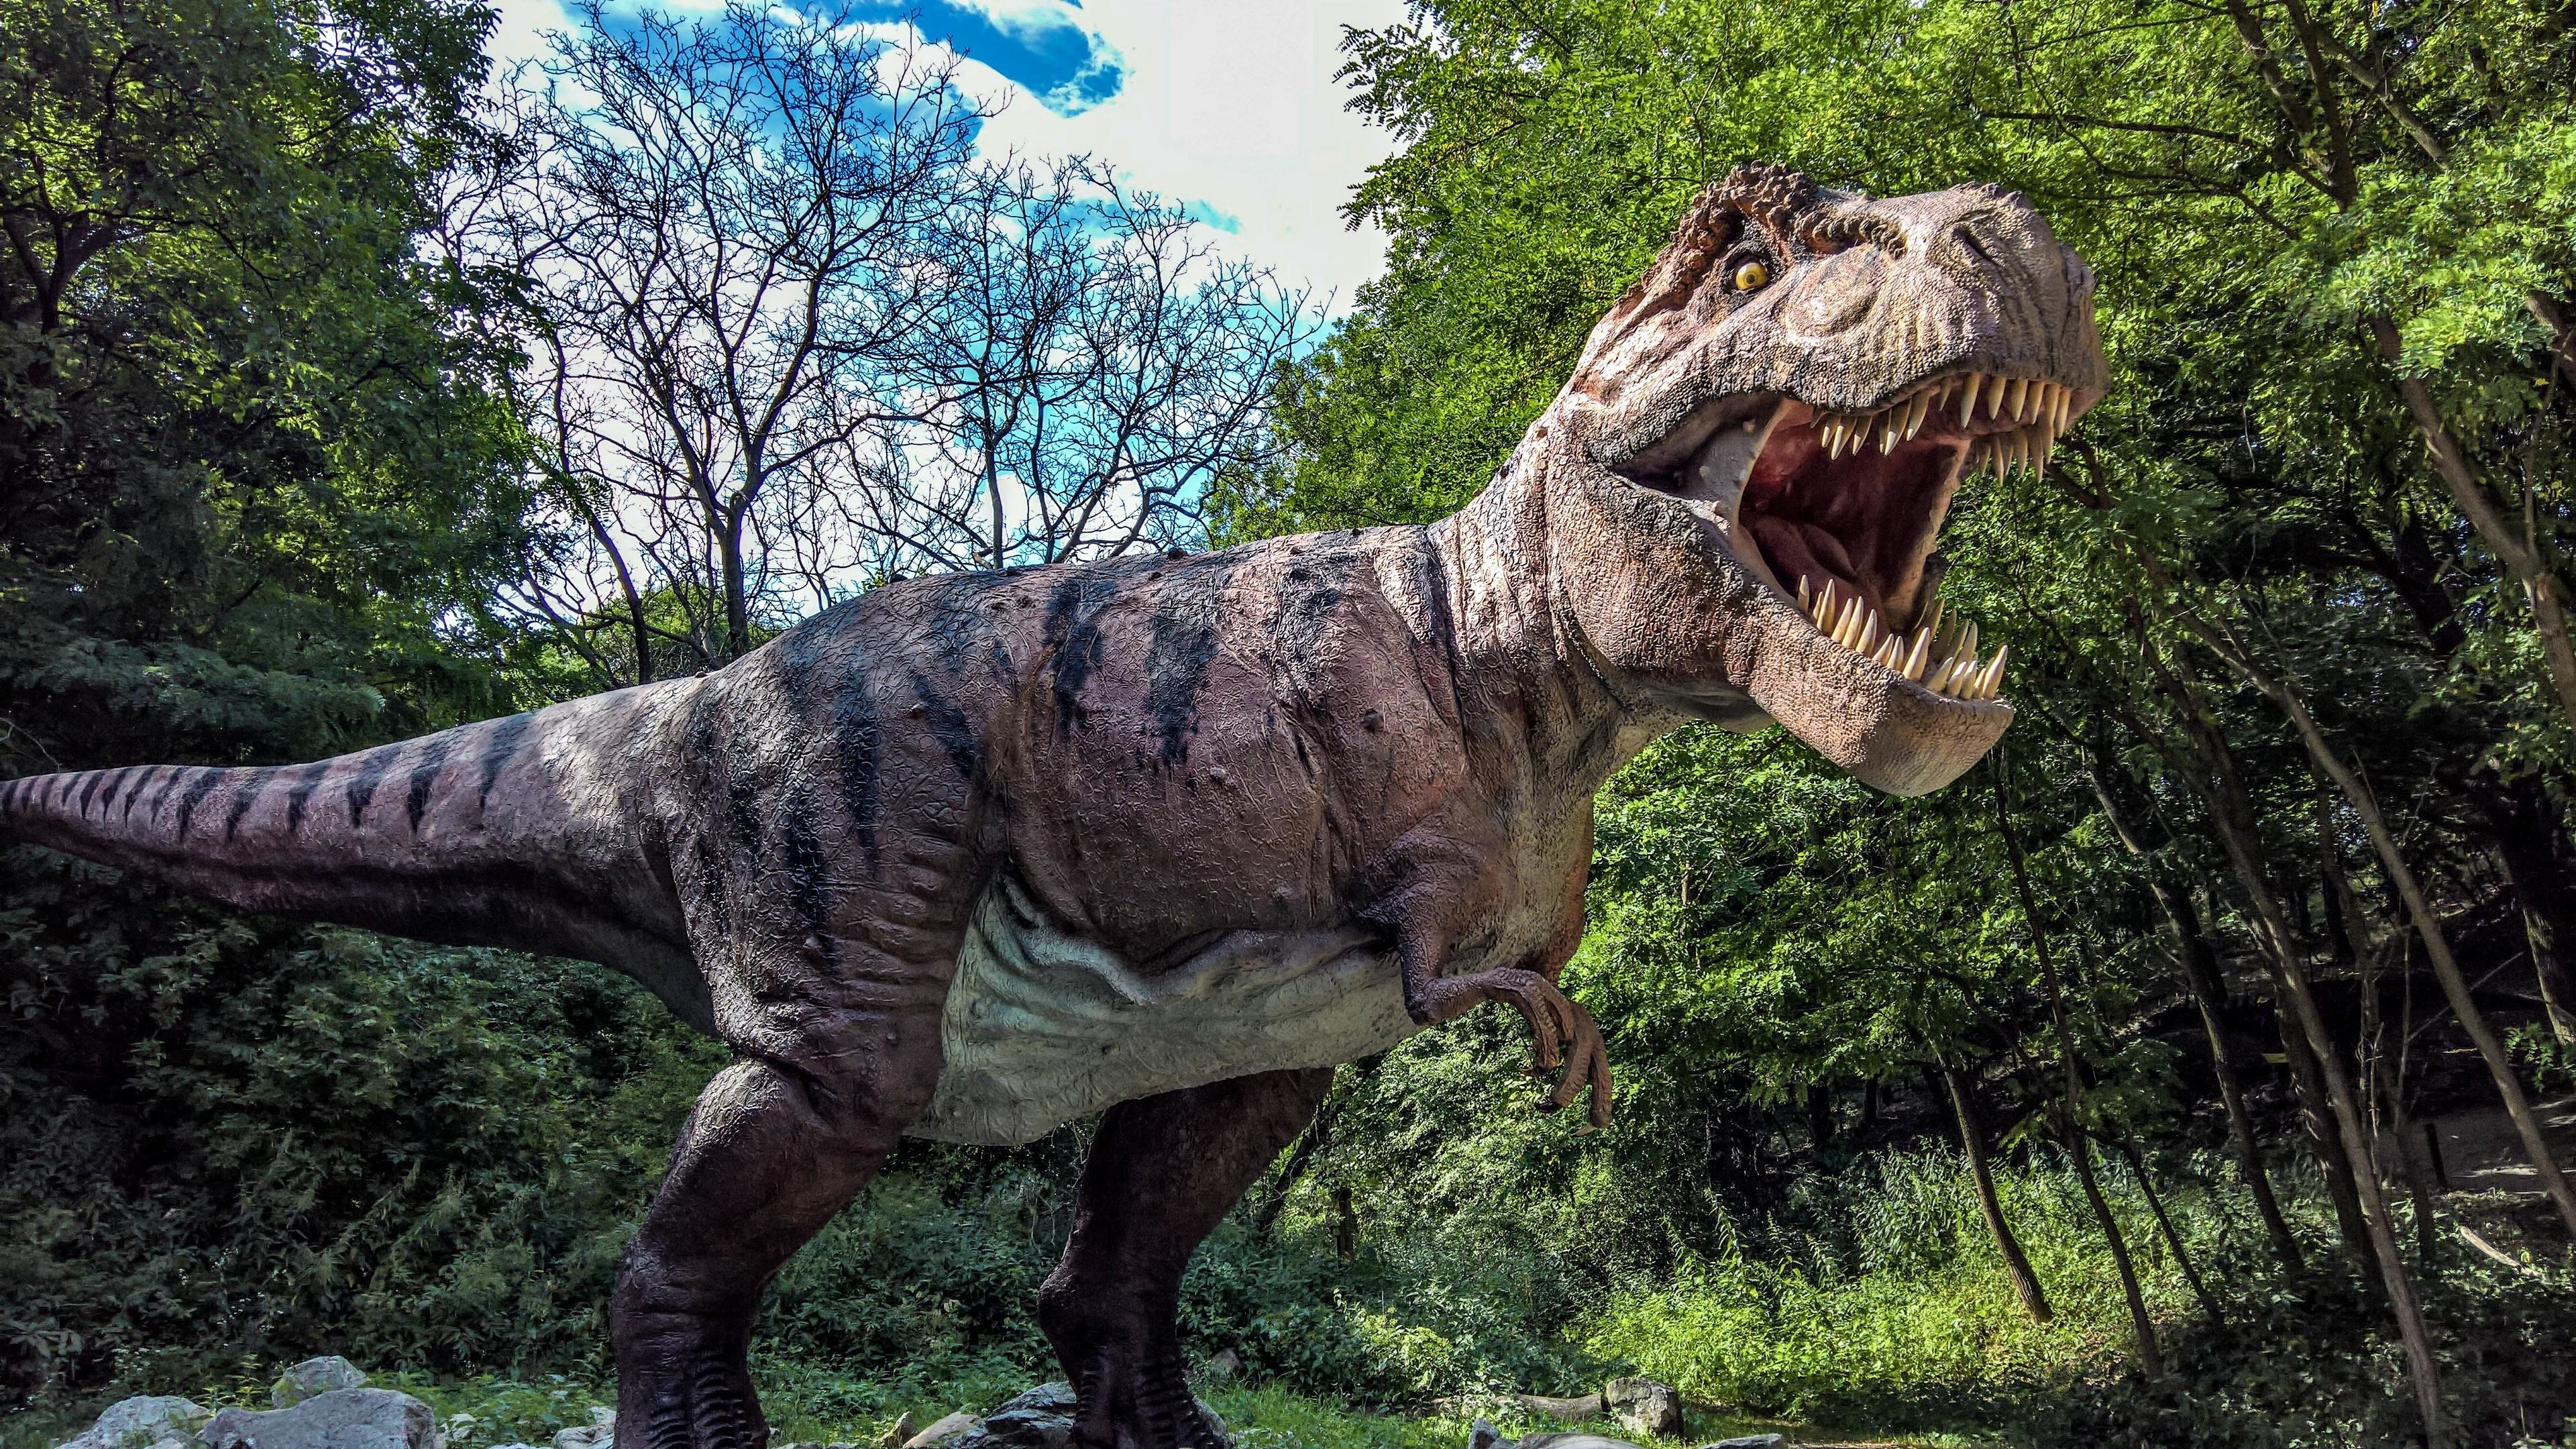 tyrannosaurus rex wallpaper 71 images